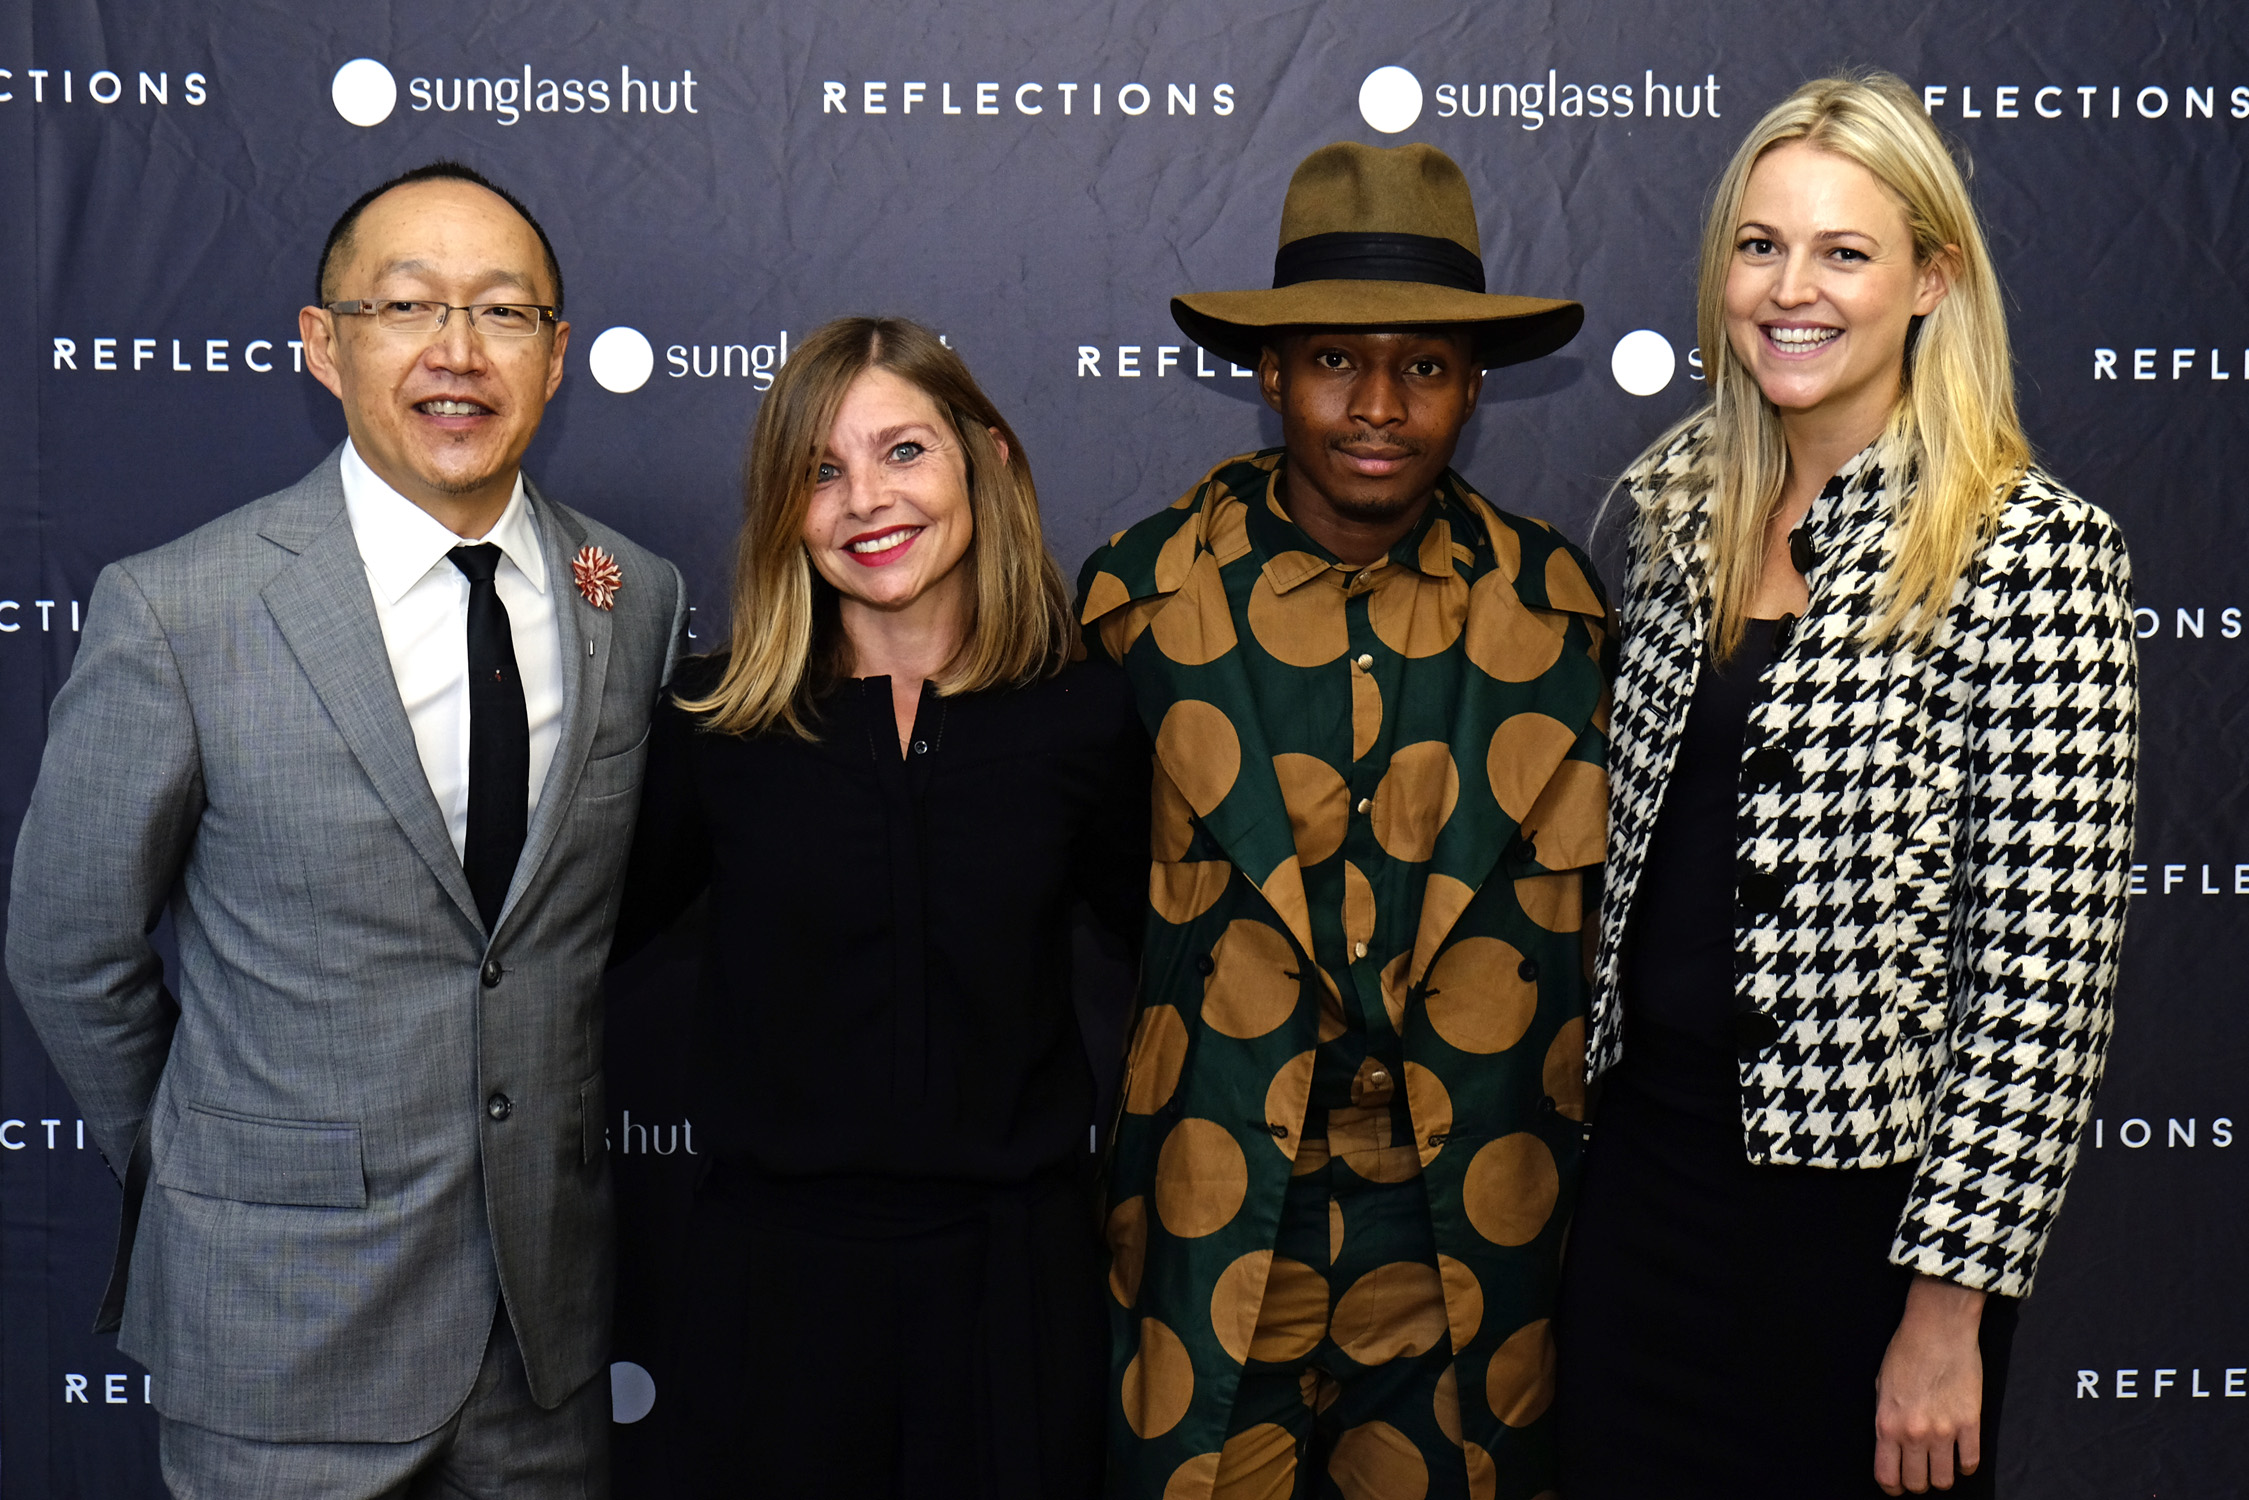 Source: Pressroom - from left to right: Dion Chang, Emilie Gambade, Trevor Stuurman & Emma Sadleir,